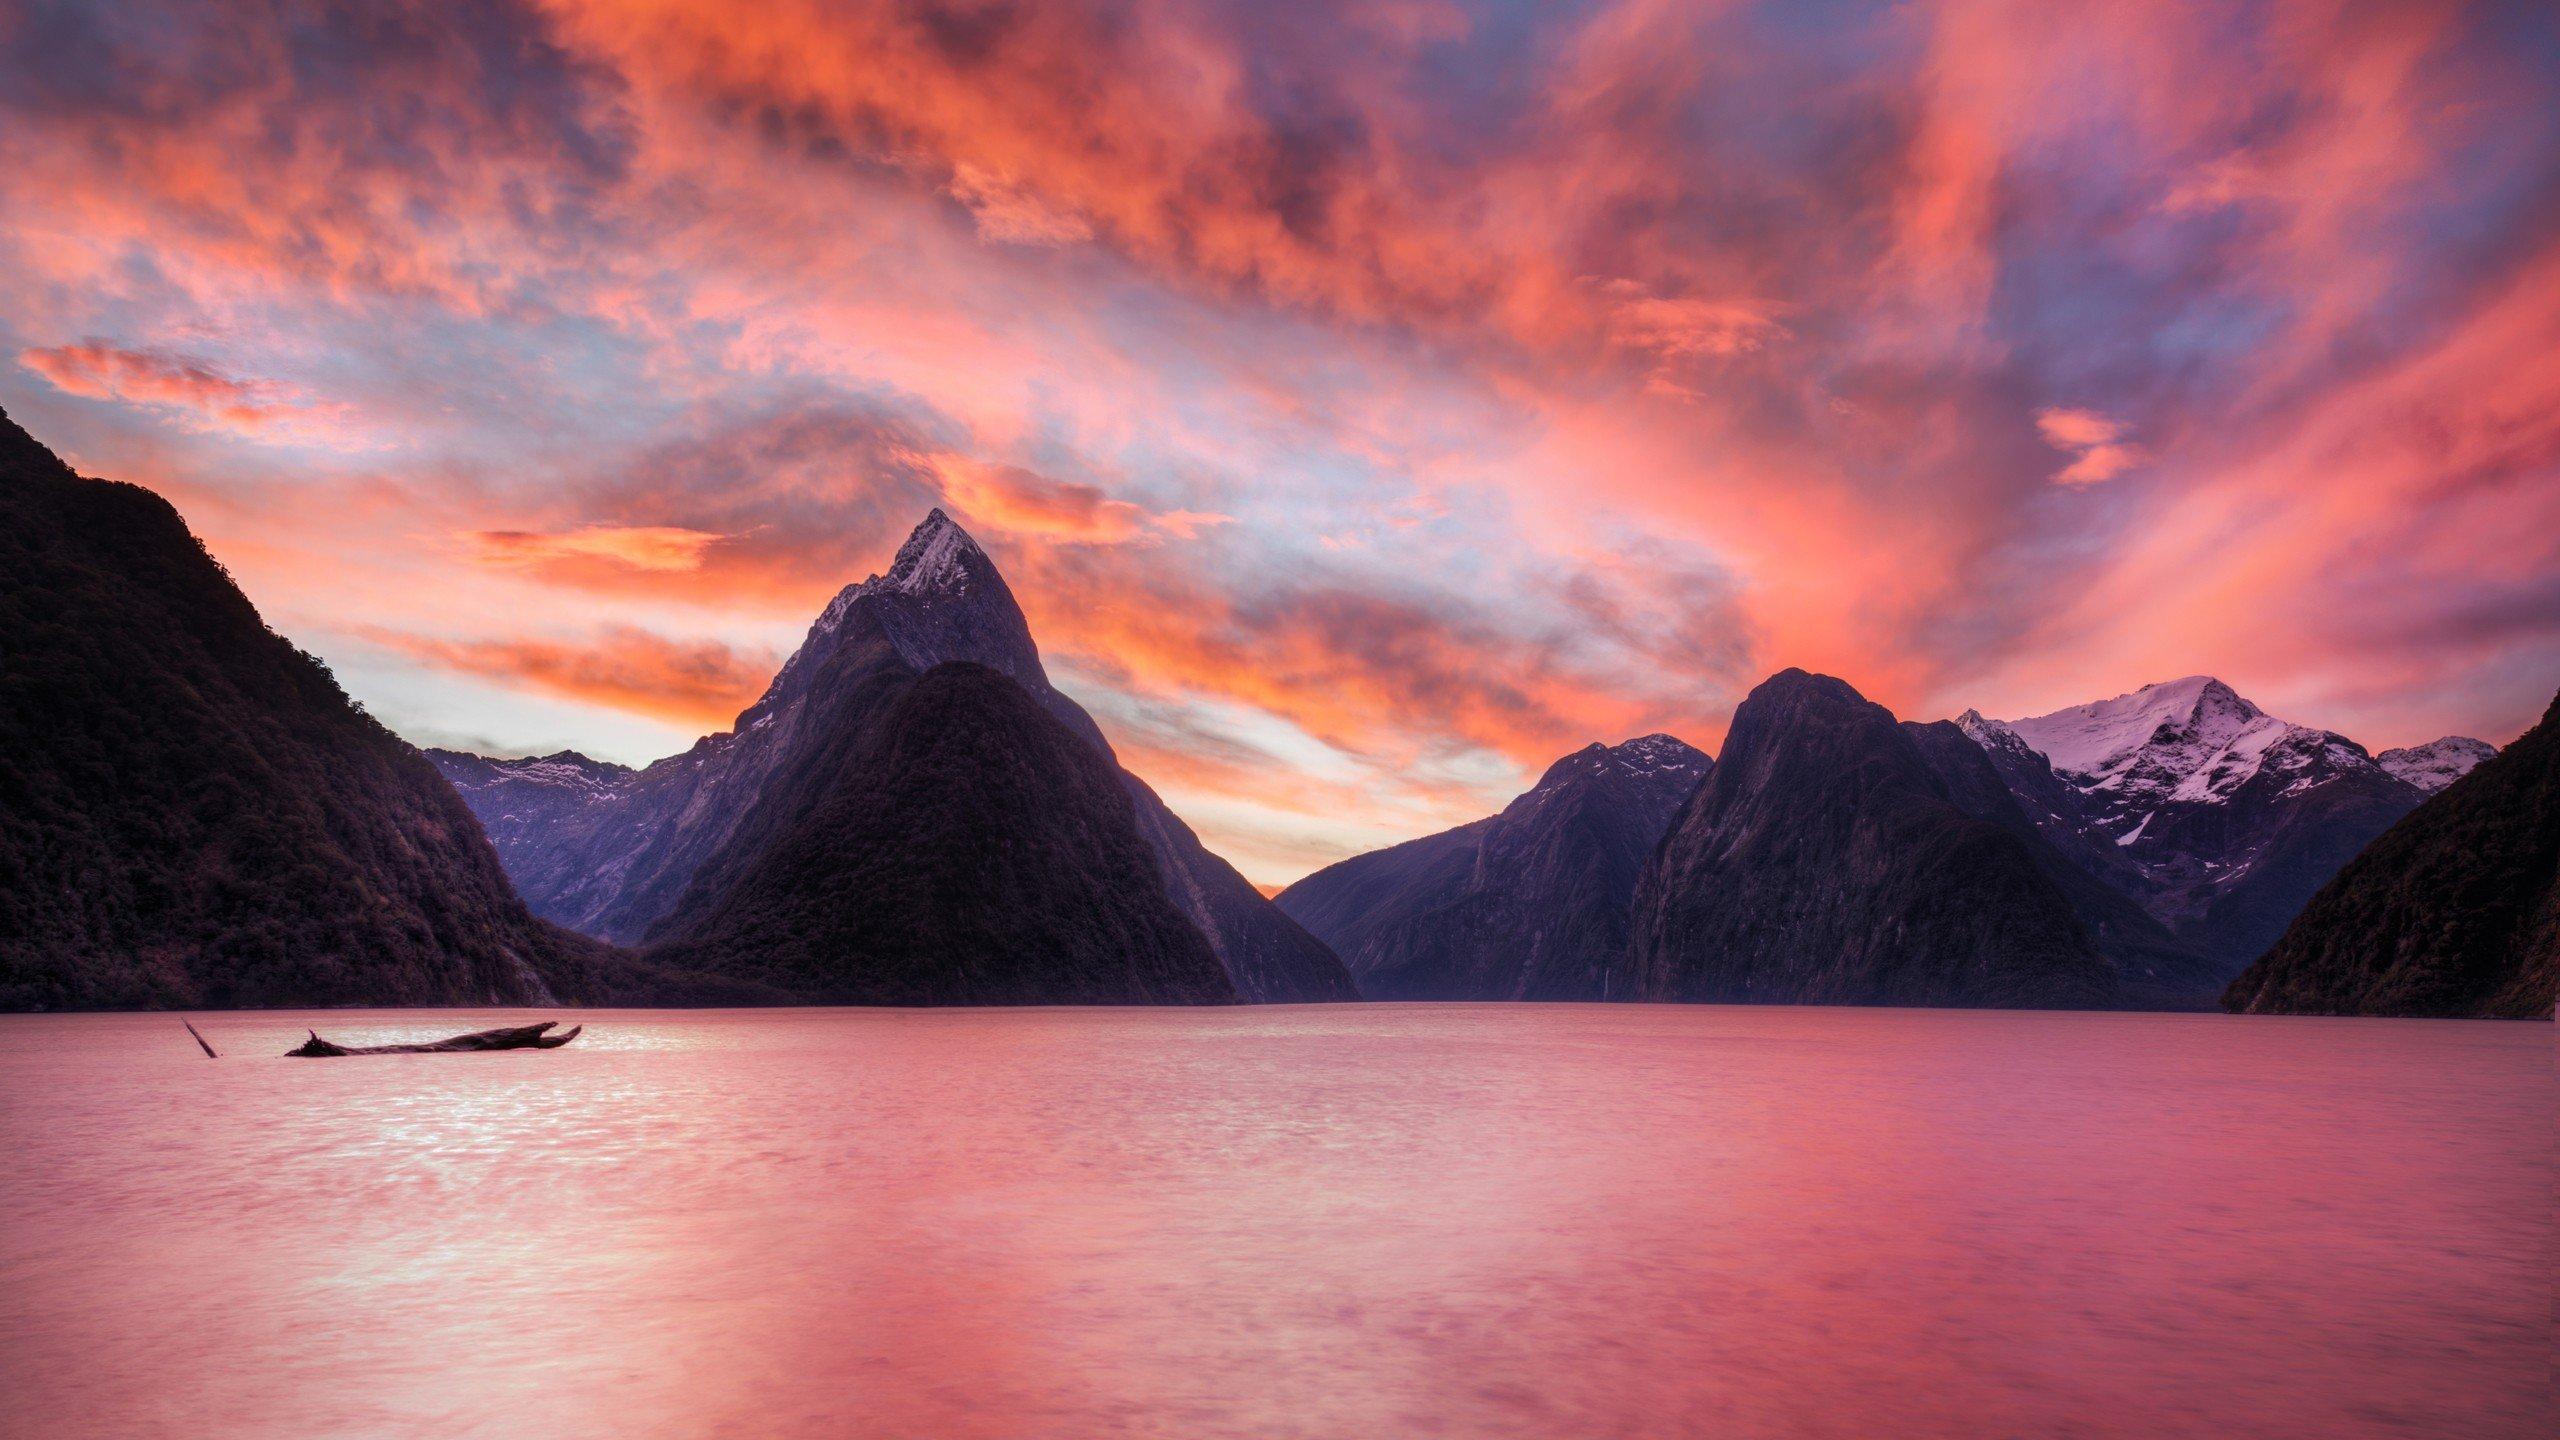 Sunset mountains landscapes nature new zealand lakes for Nz landscape